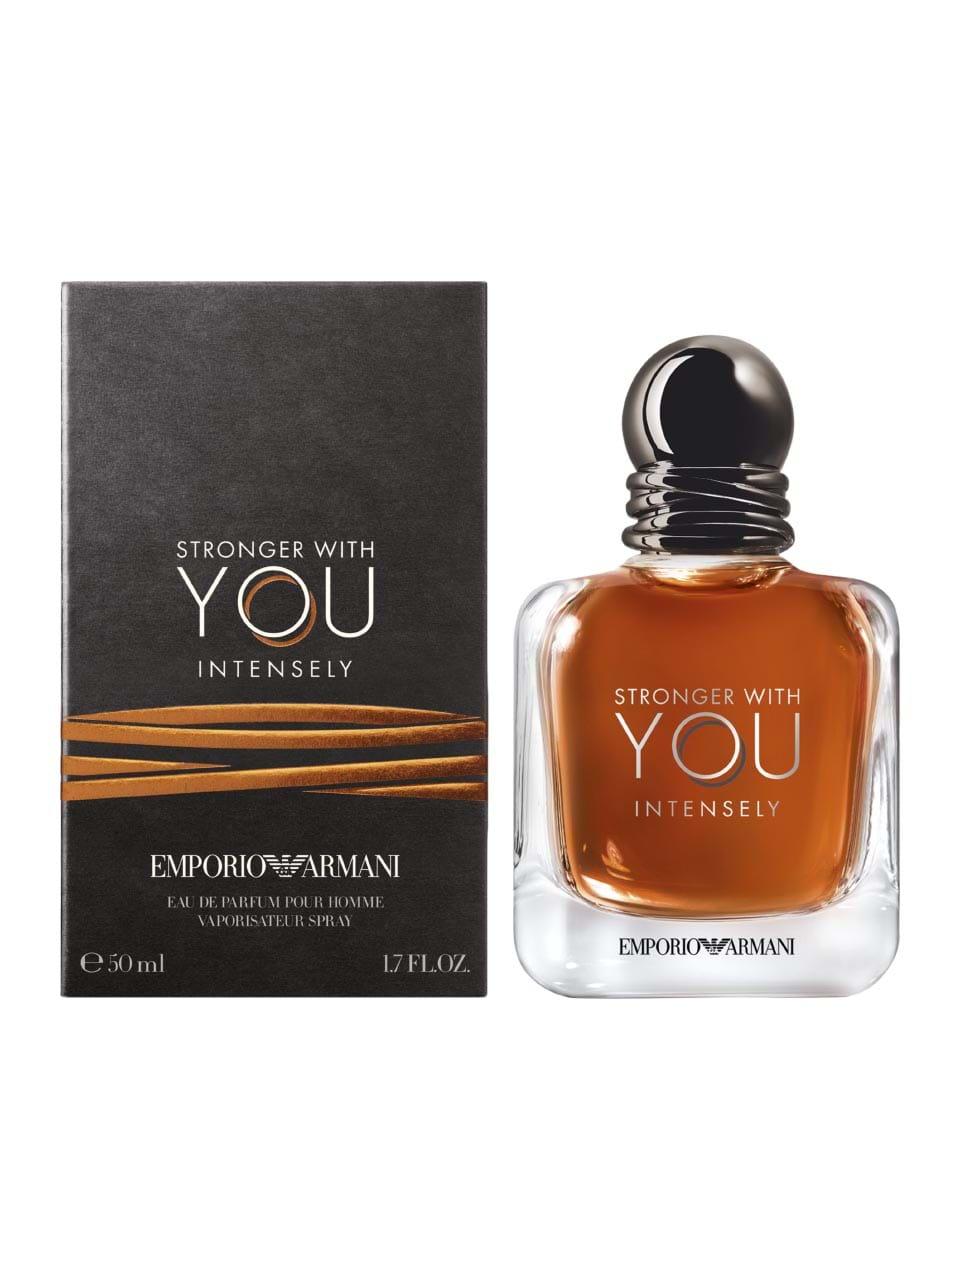 De Giorgio Edp 50 Ml You Eau Parfum Armani Stronger Intense With Emporio 35AL4jR